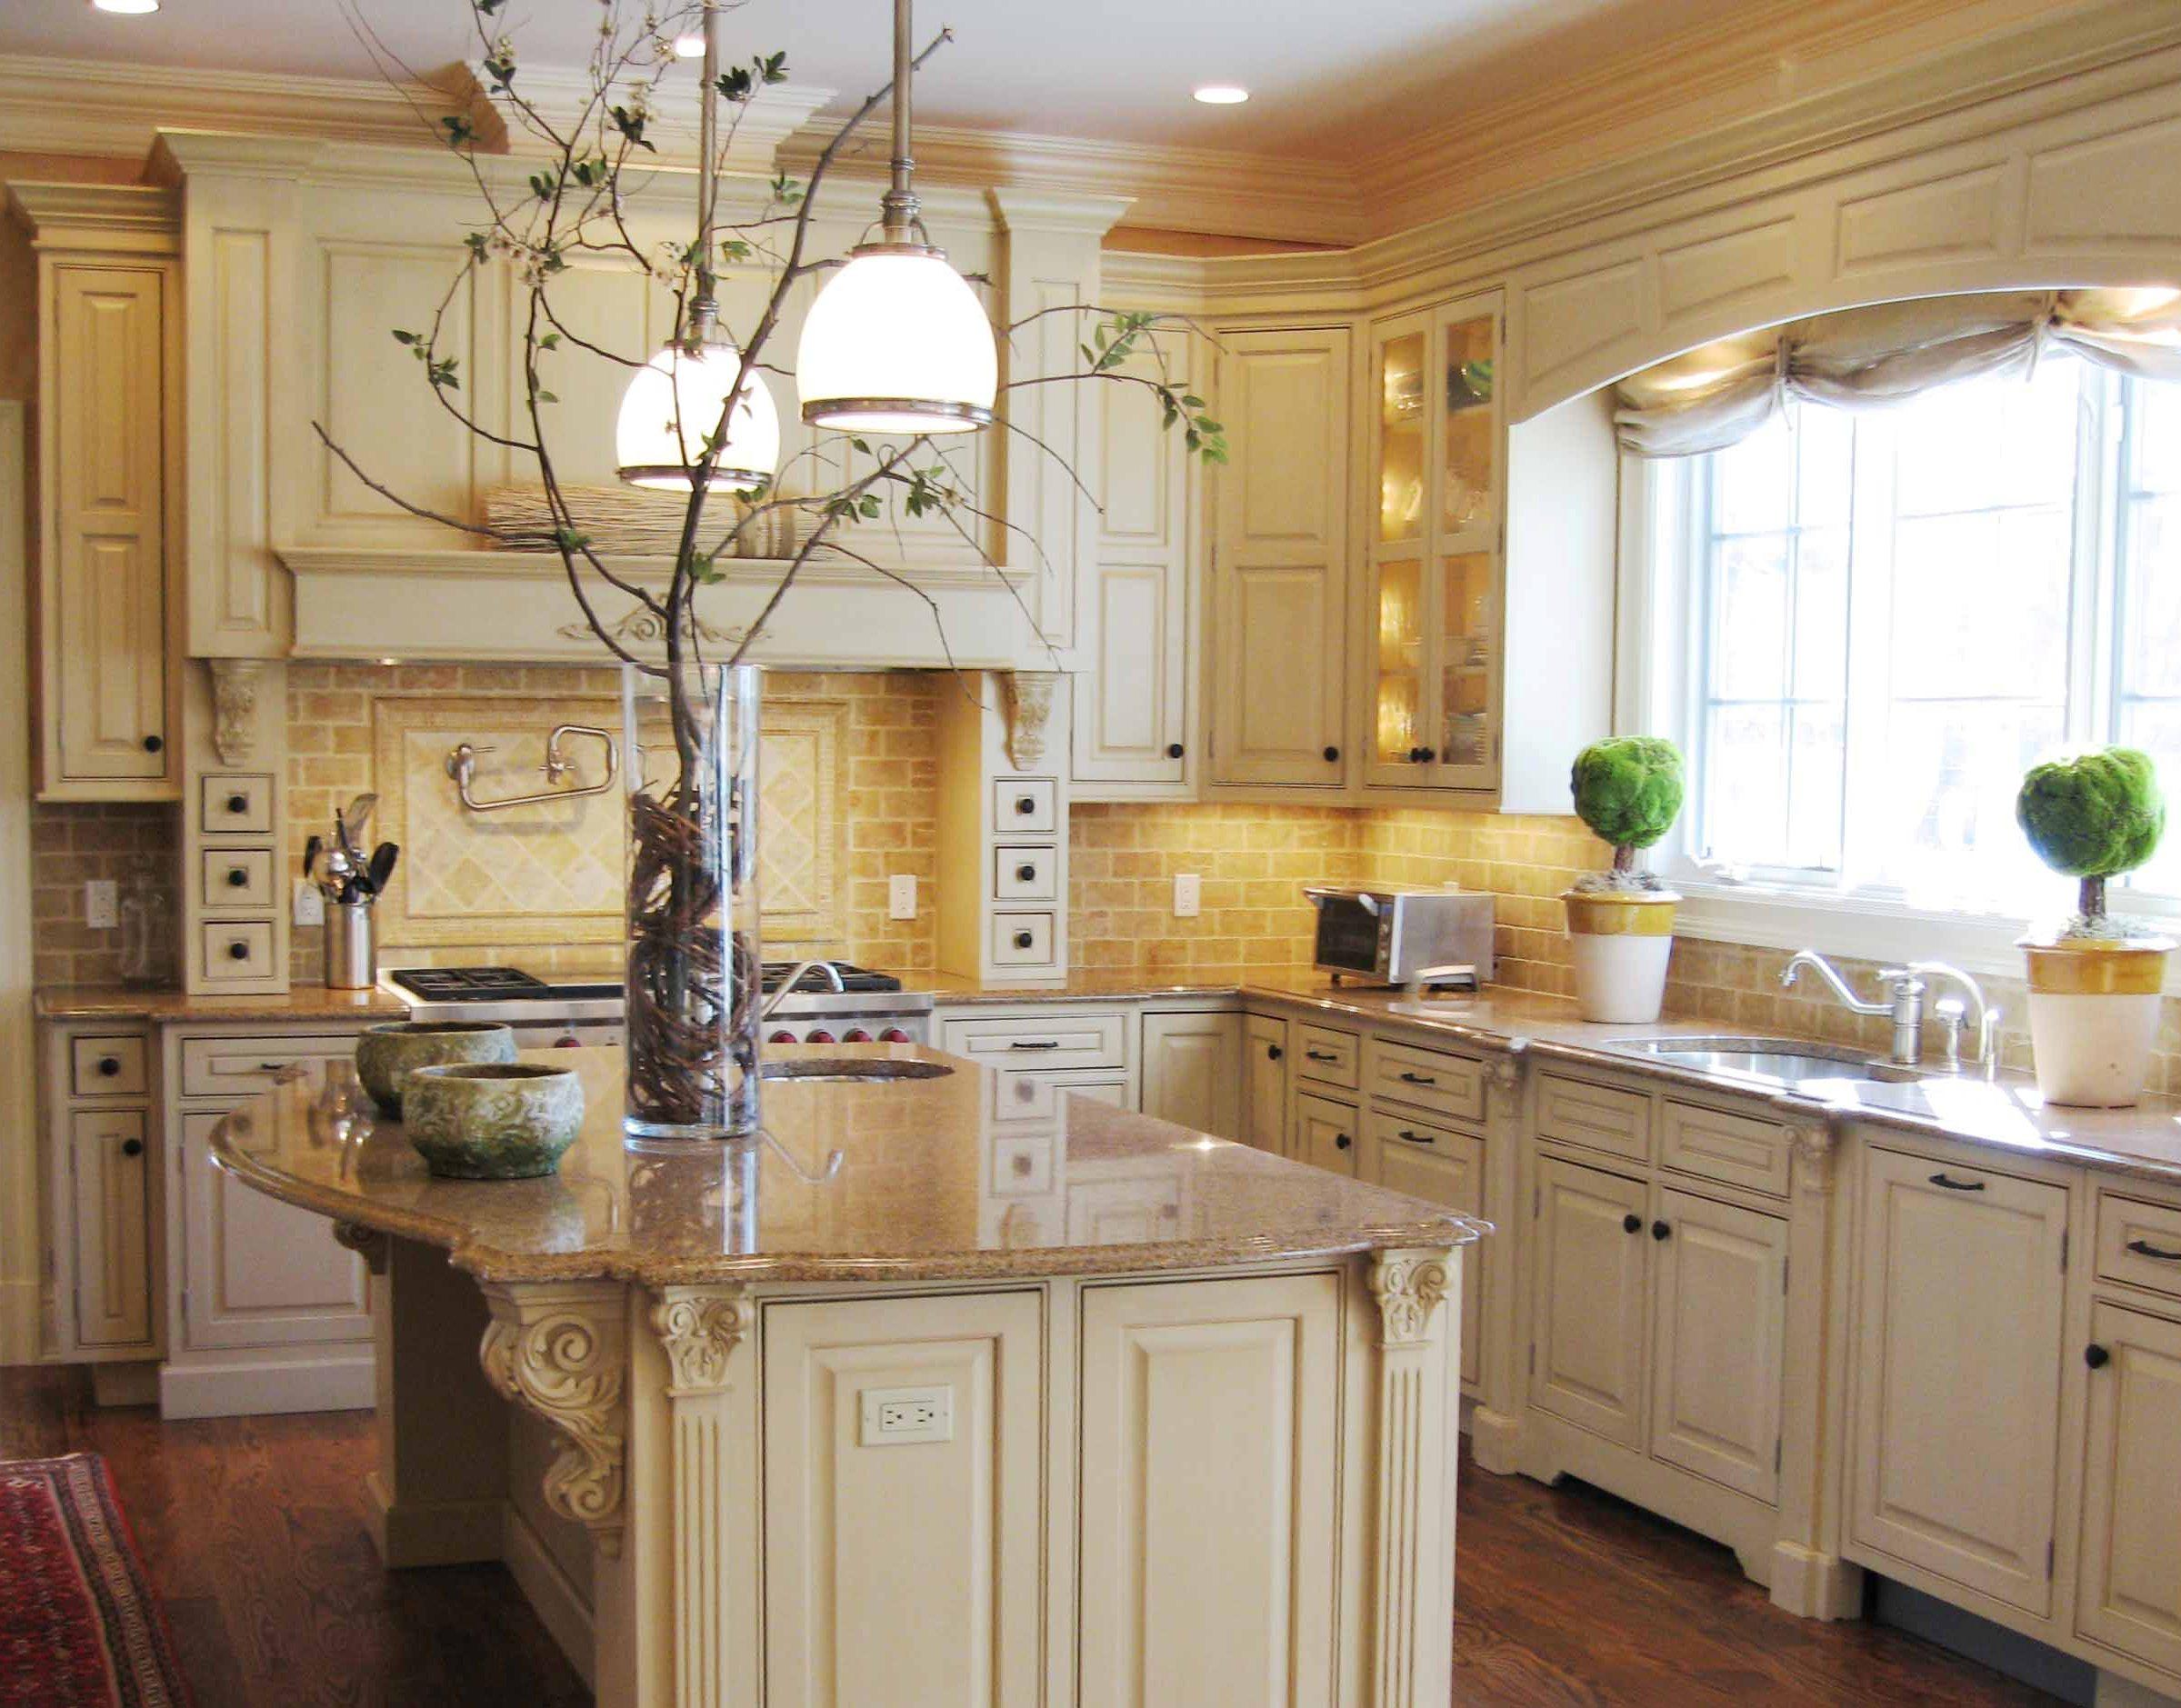 tuscan kitchen cabinets ideas photo - 6